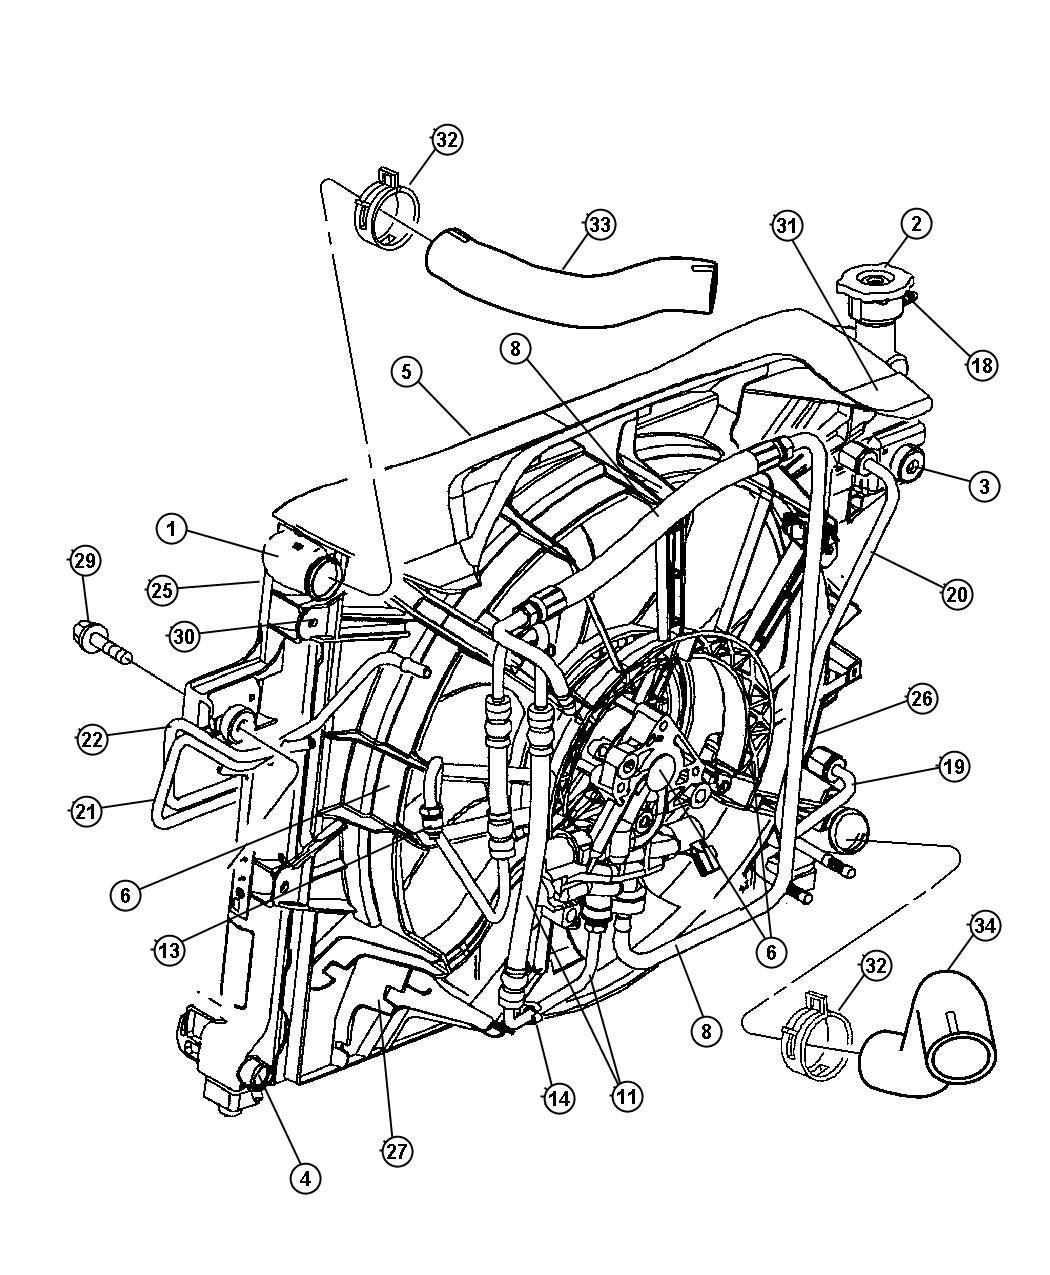 52079860AE - Jeep Fan. Radiator cooling. Conector | Mopar ...